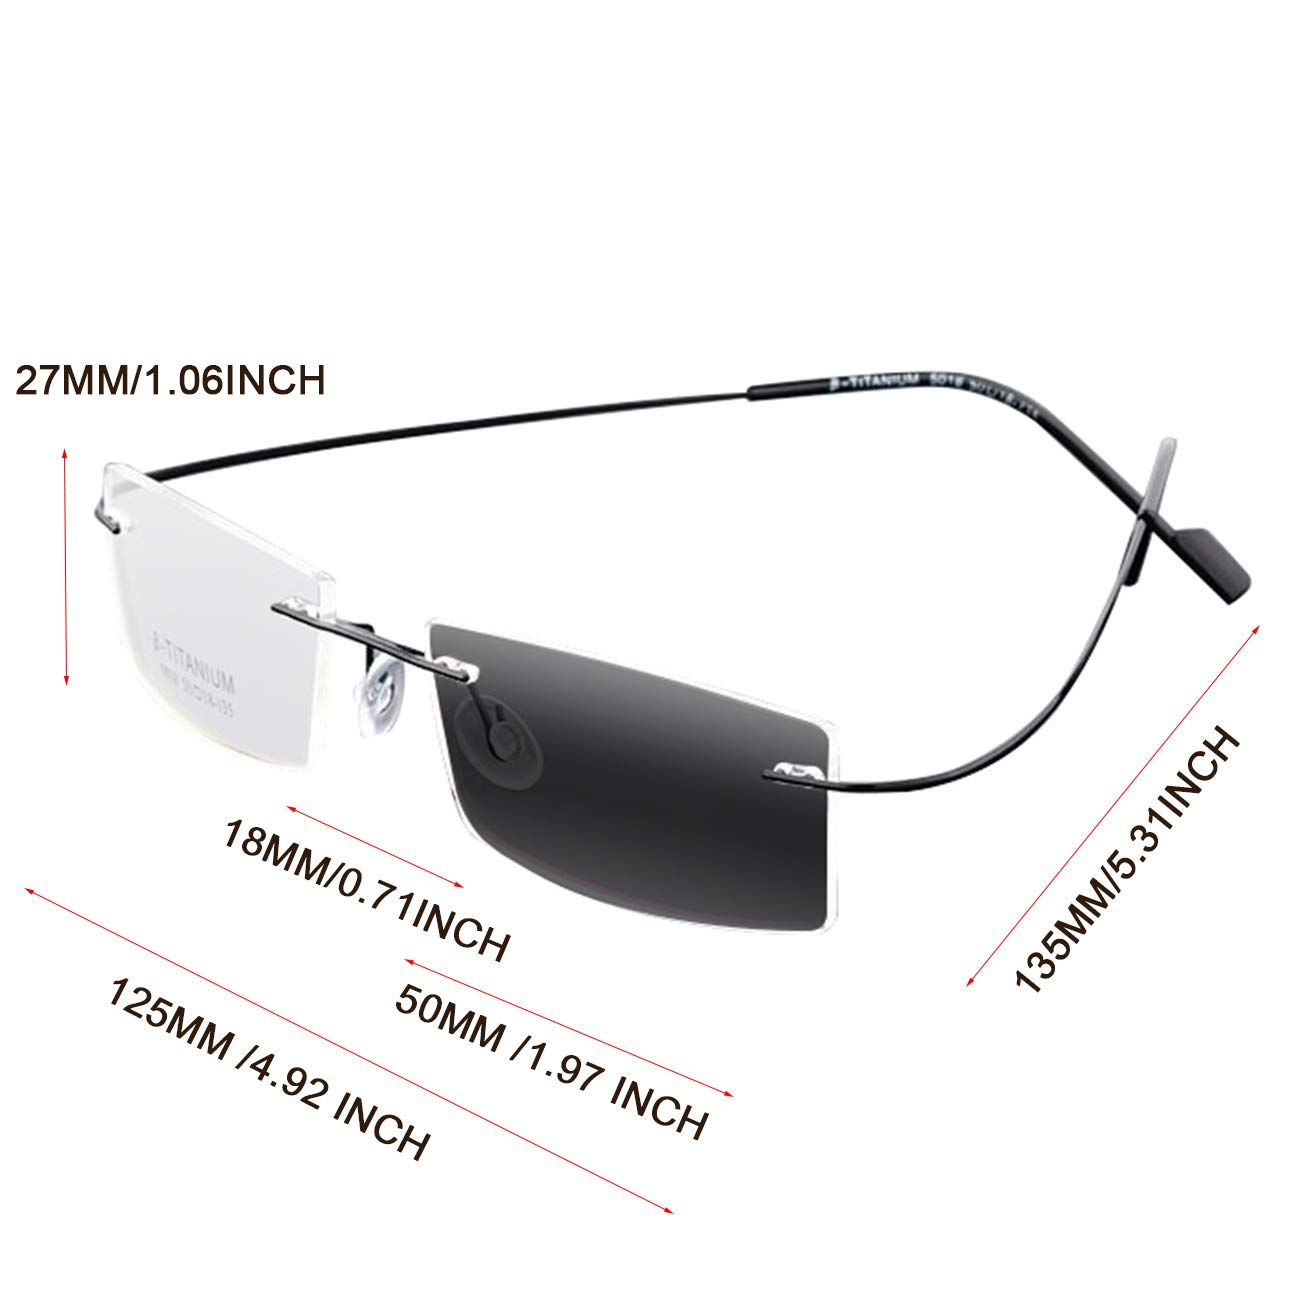 34d8727b534 Amazon.com  Unisex Titanium Frameless Progressive Power Photochromic Reading  Glasses Multifocal Presbyopia Rimless Sunglasses (Black